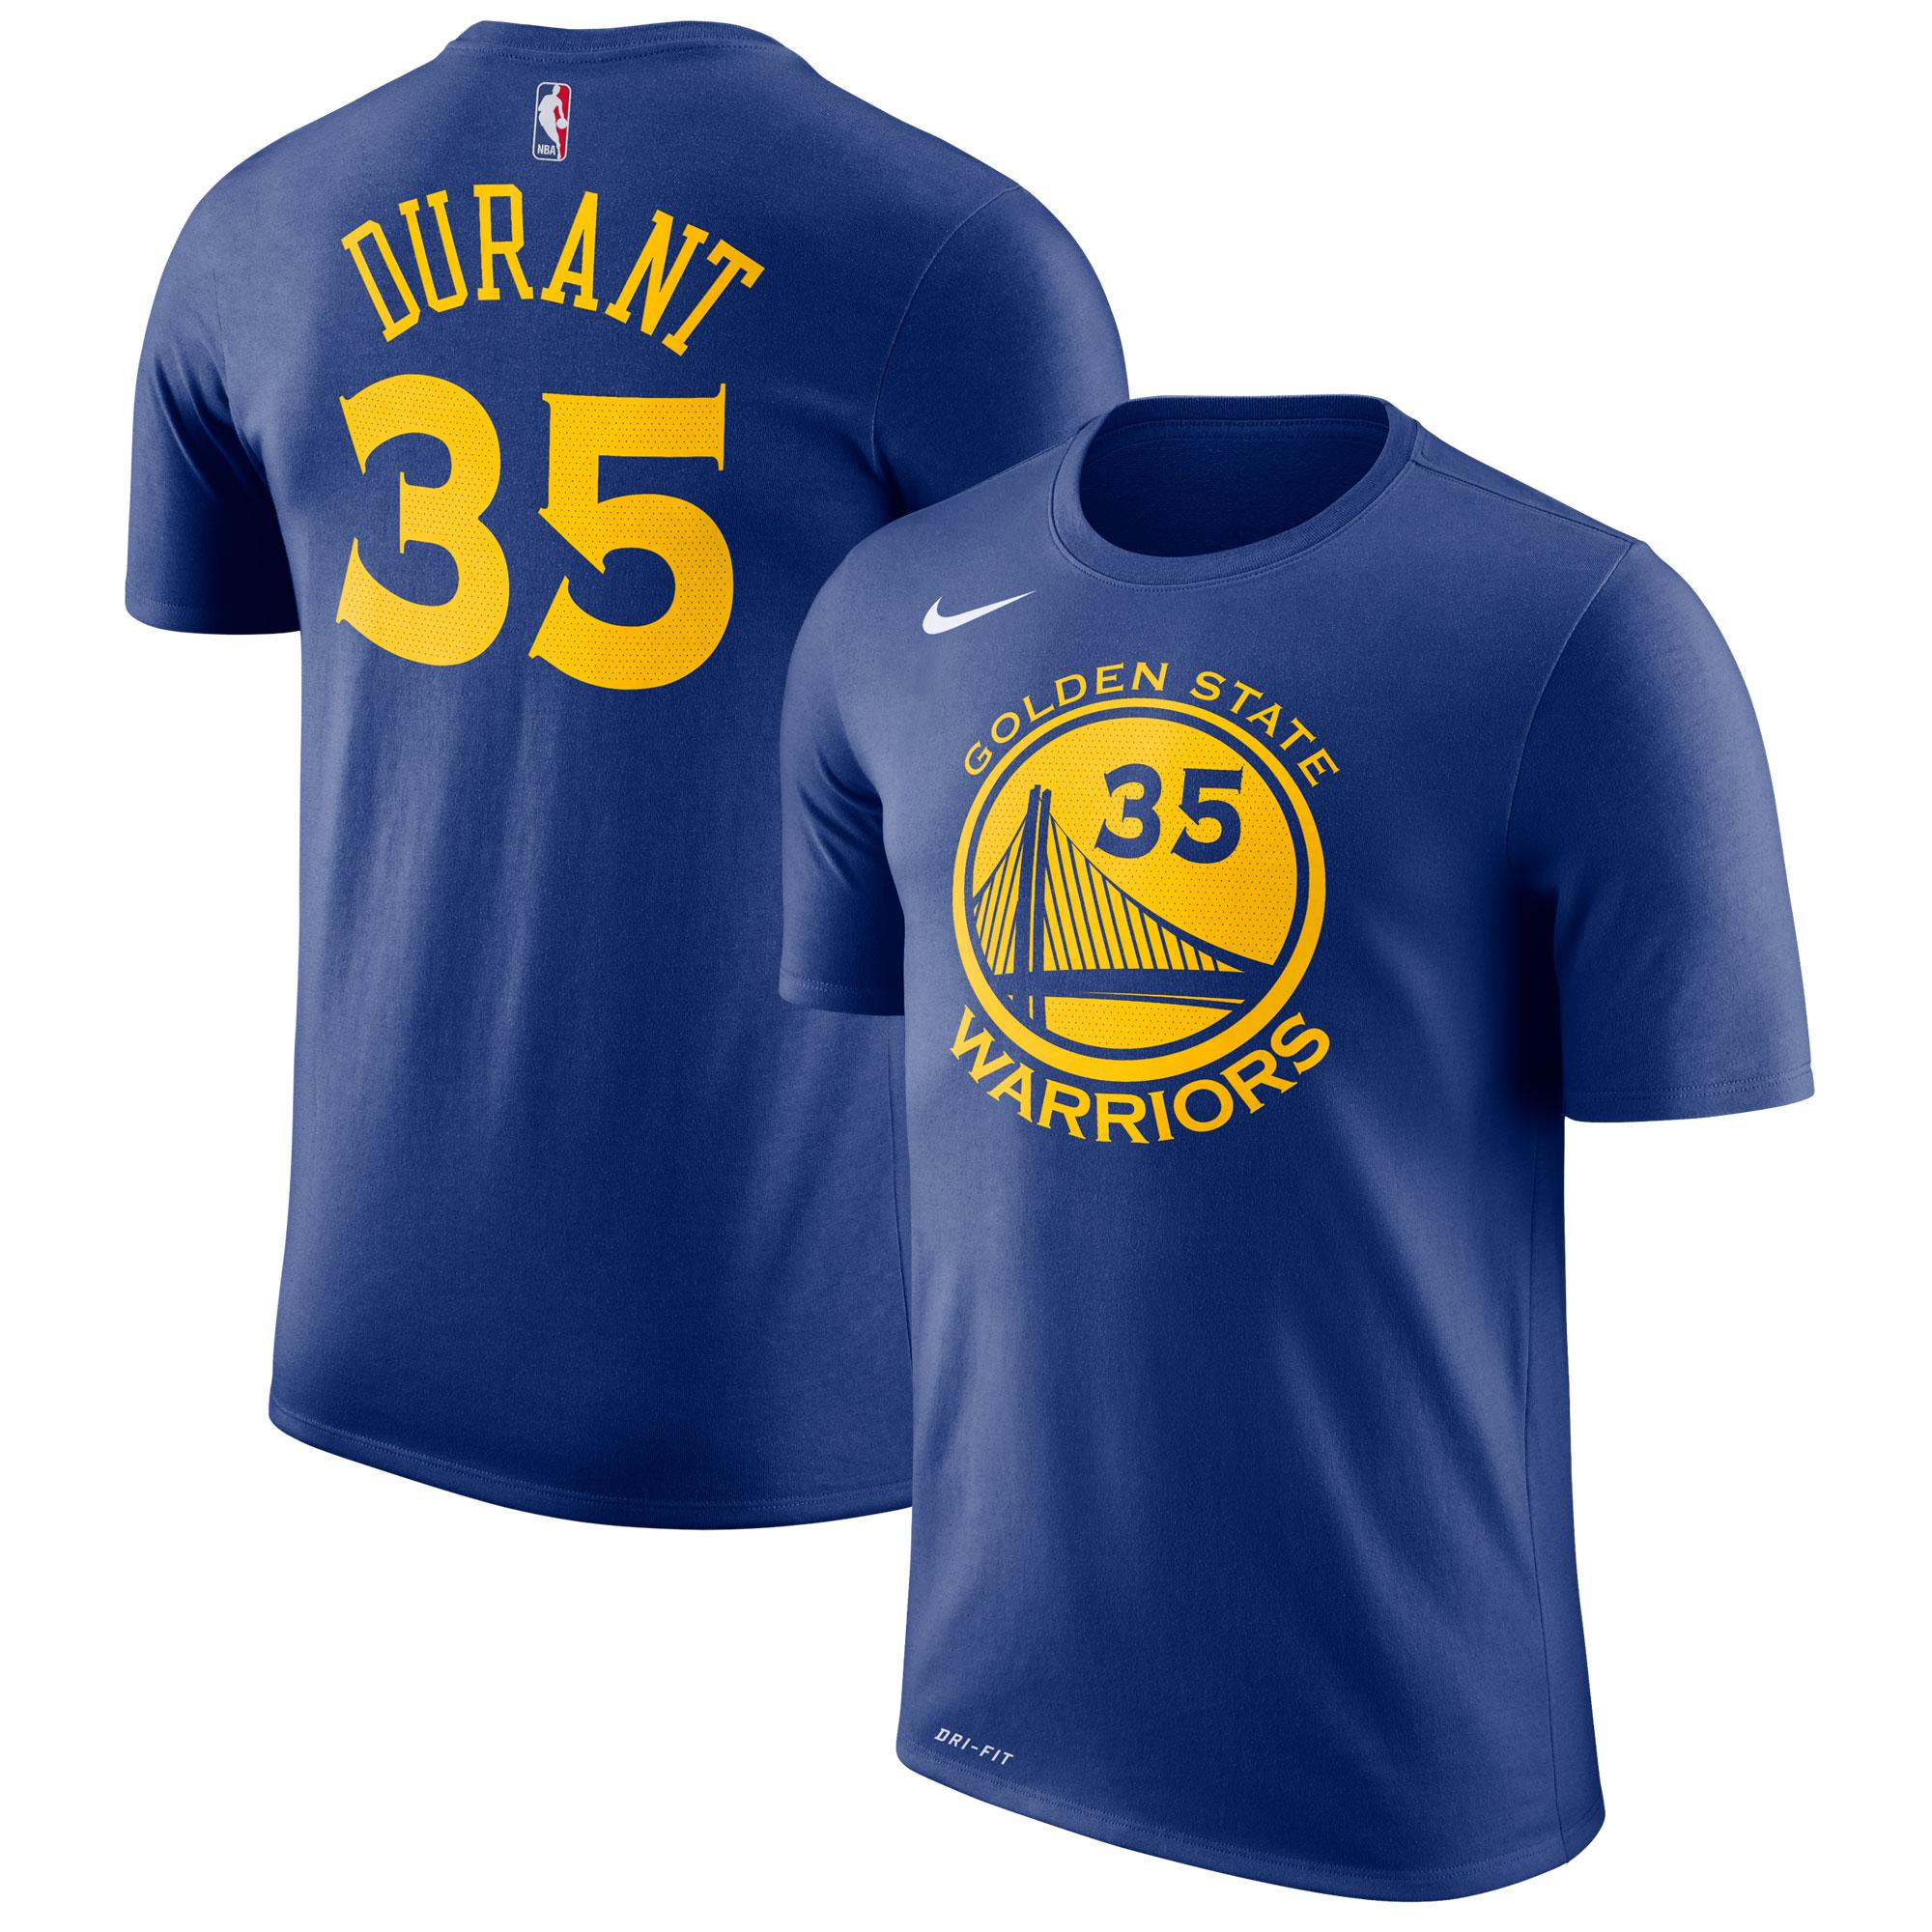 a77dbe4f3 Basketbalové kluby (všetky) | Nike Golden State Warriors Kevin ...